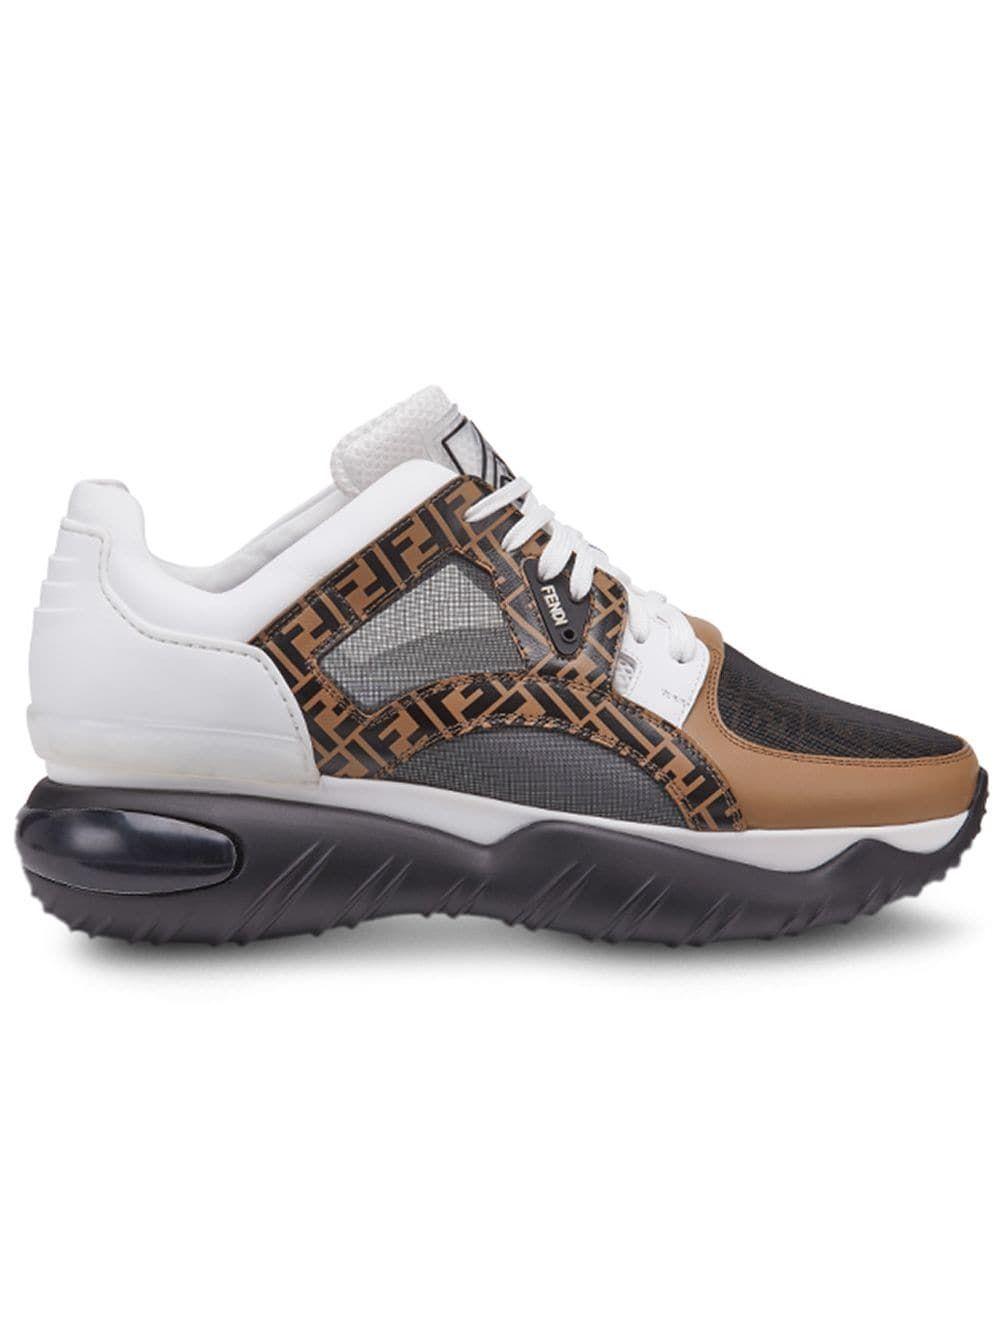 db8bfa3853 FENDI FENDI CHUNKY MONOGRAM RUNNER SNEAKERS - BROWN. #fendi #shoes ...